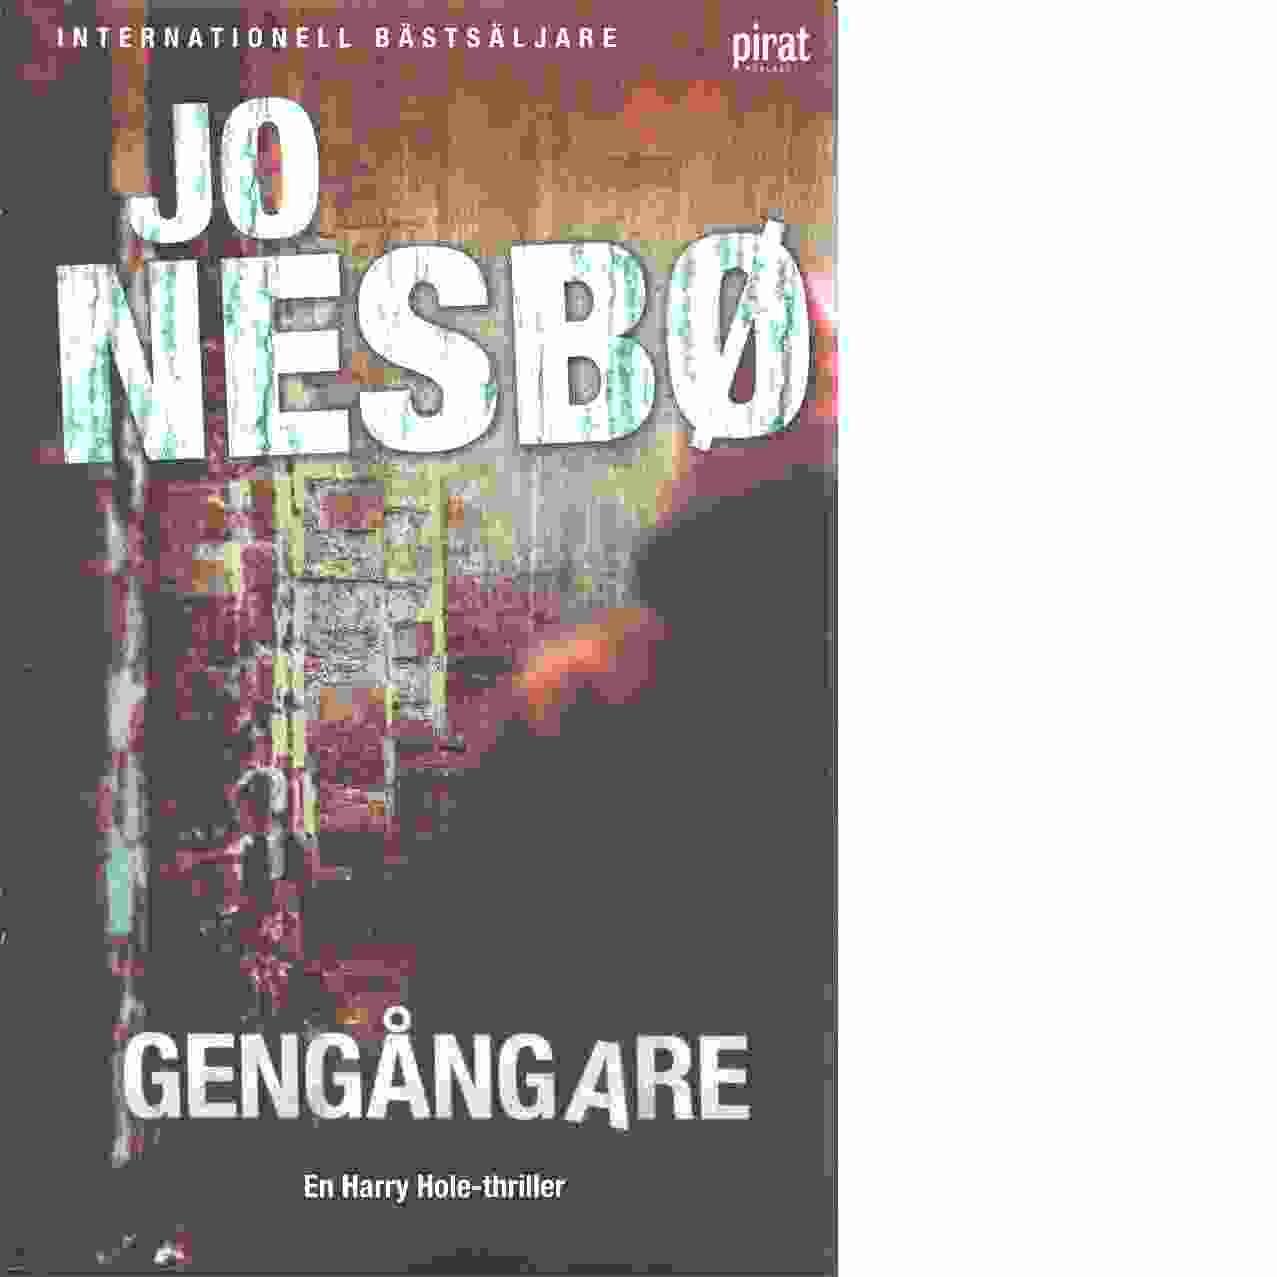 Gengångare - Nesbø, Jo